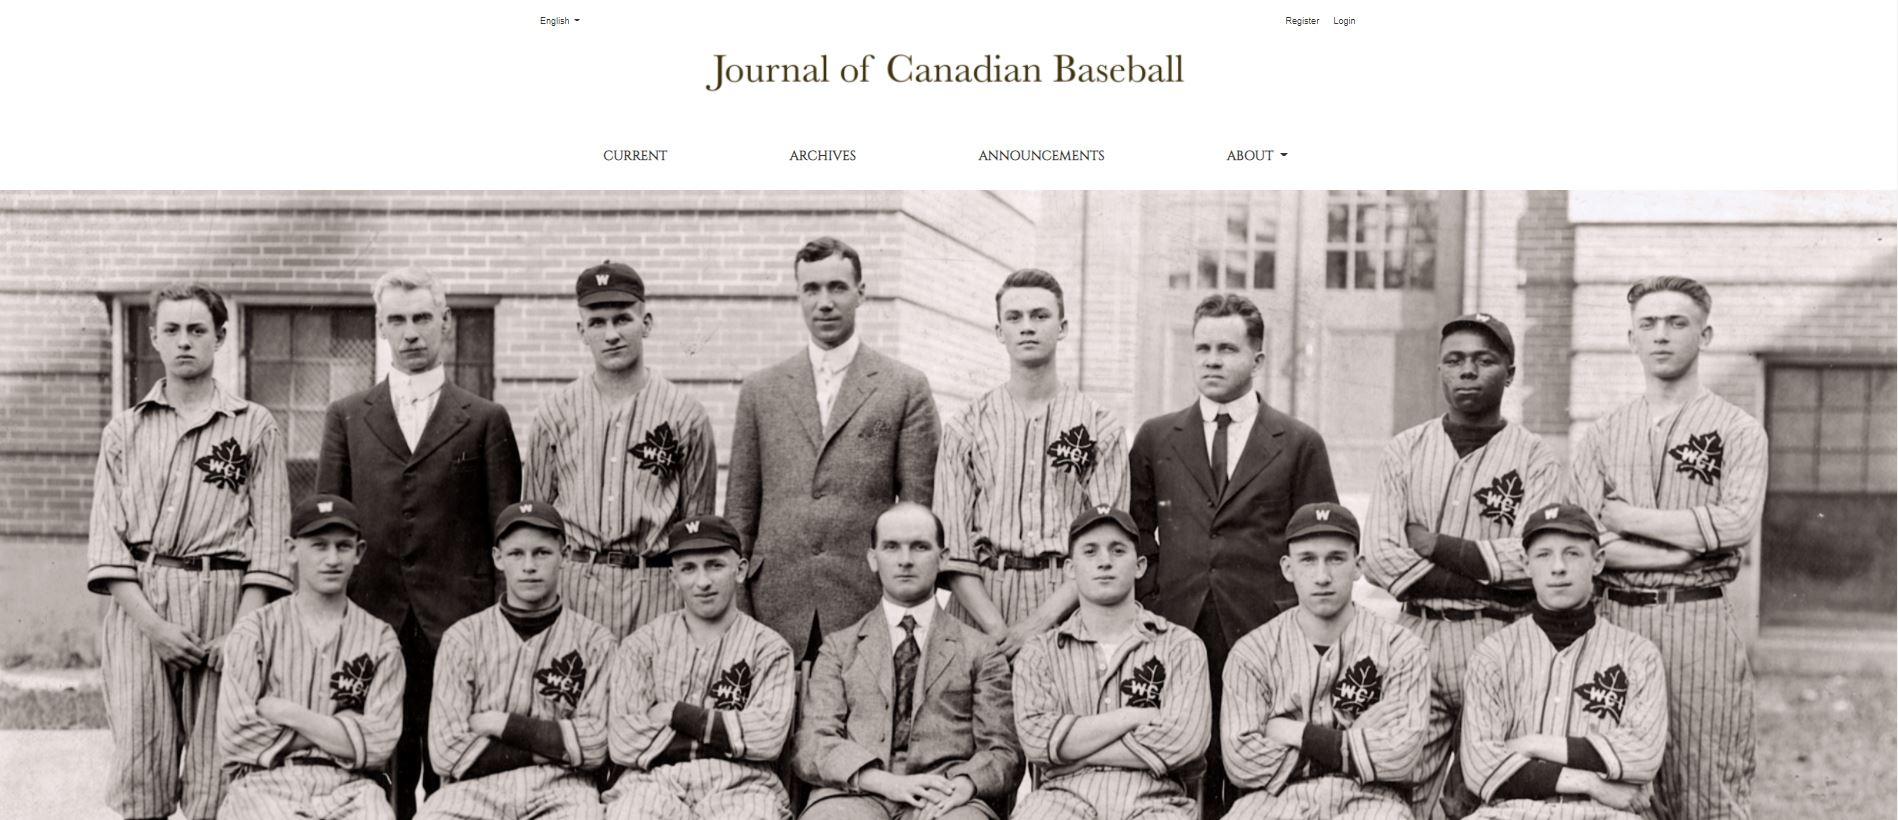 Canadian Journal of Baseball